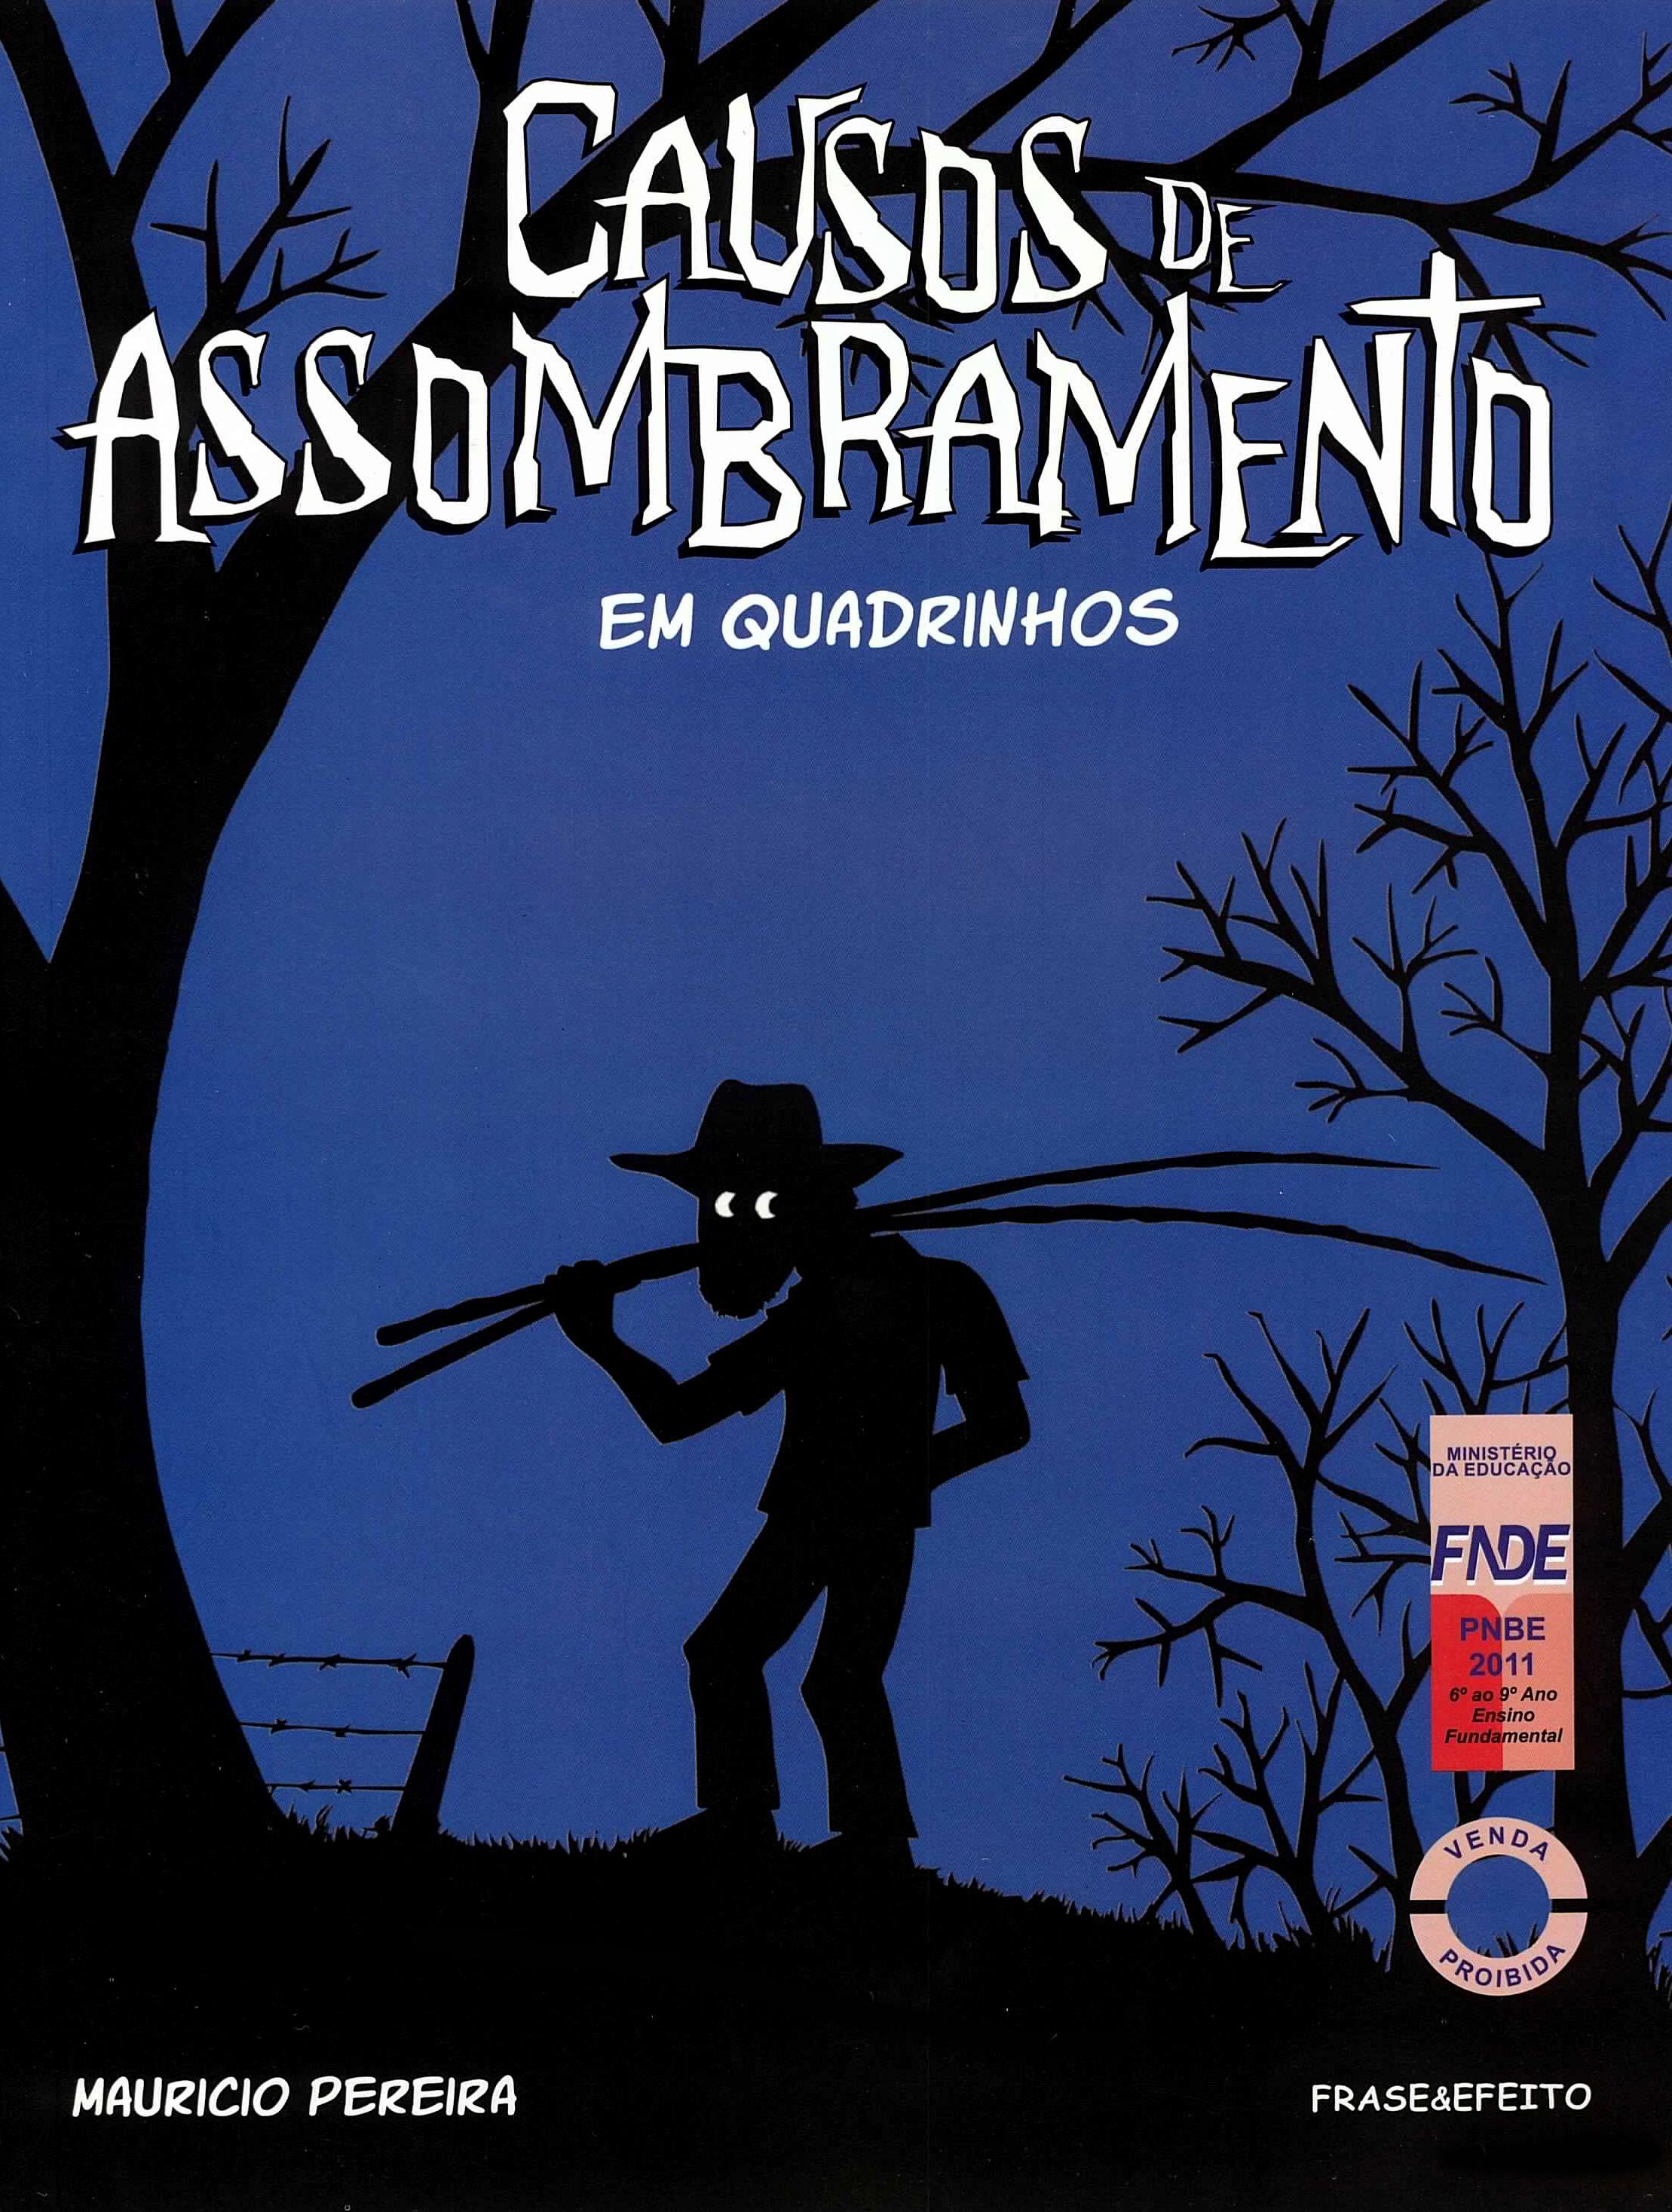 Causos_Assombrosos_PNBE.jpg